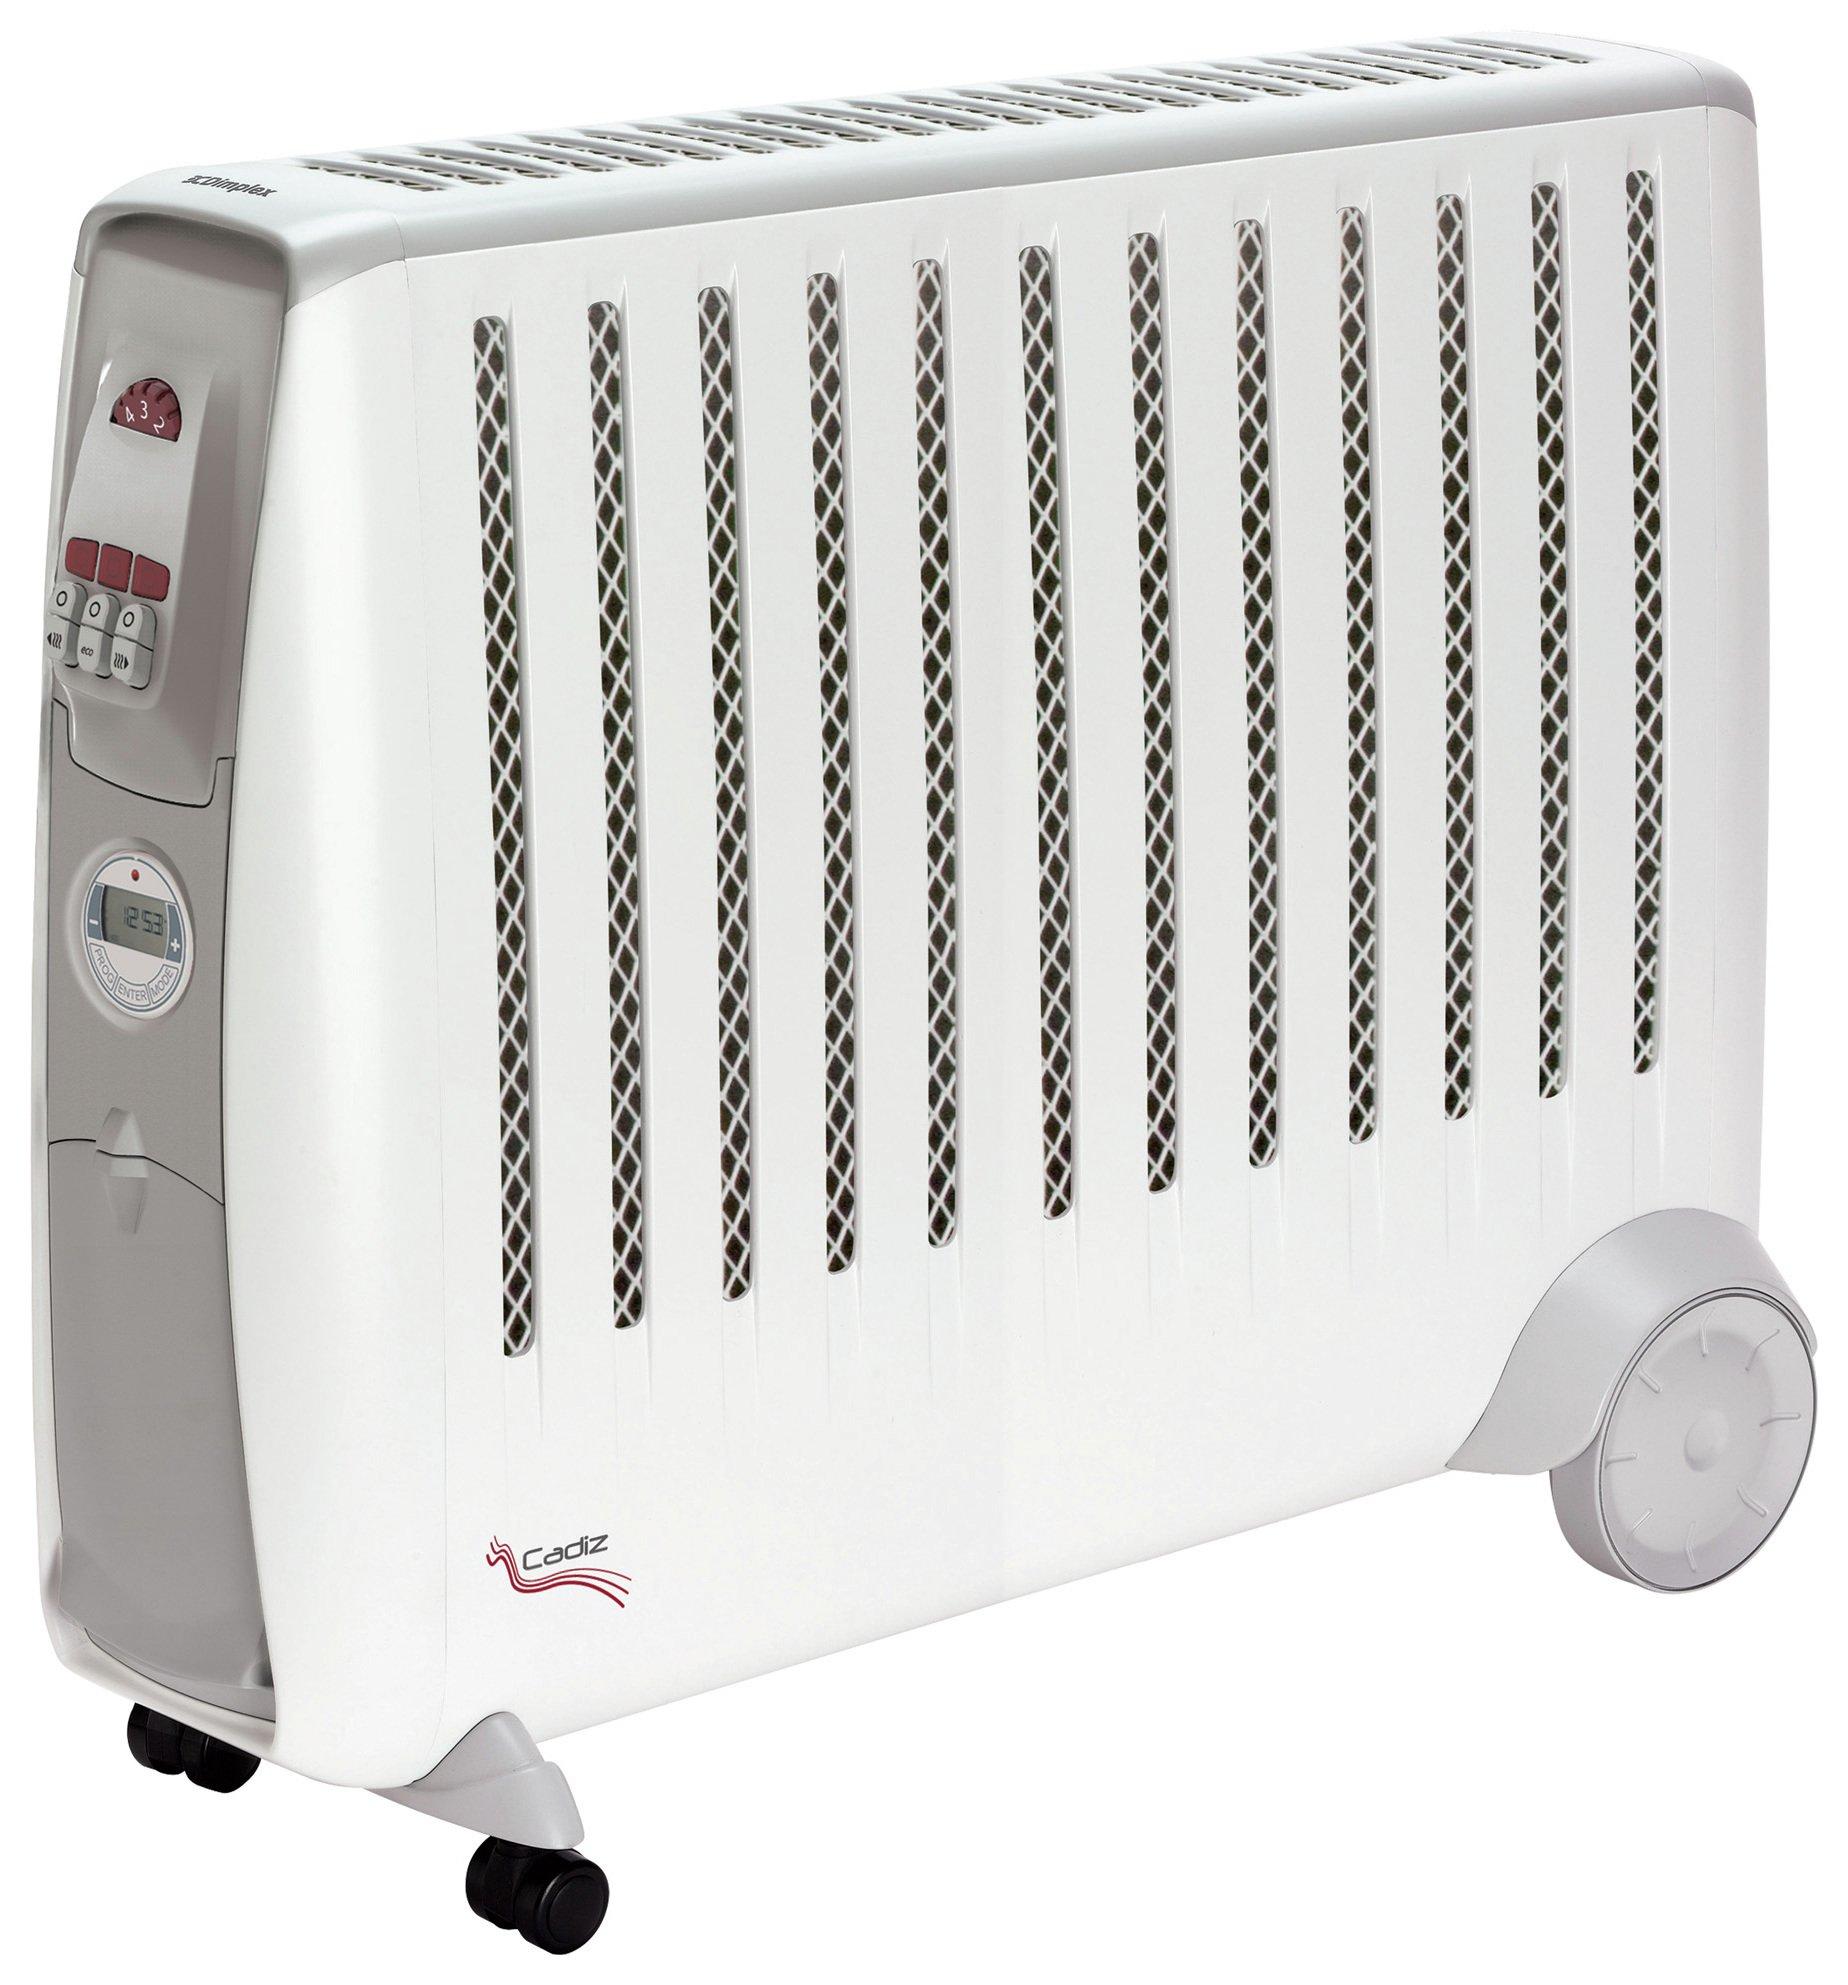 Image of Dimplex - Cadiz Eco CDE3Tie 3kW Oil Free Radiator